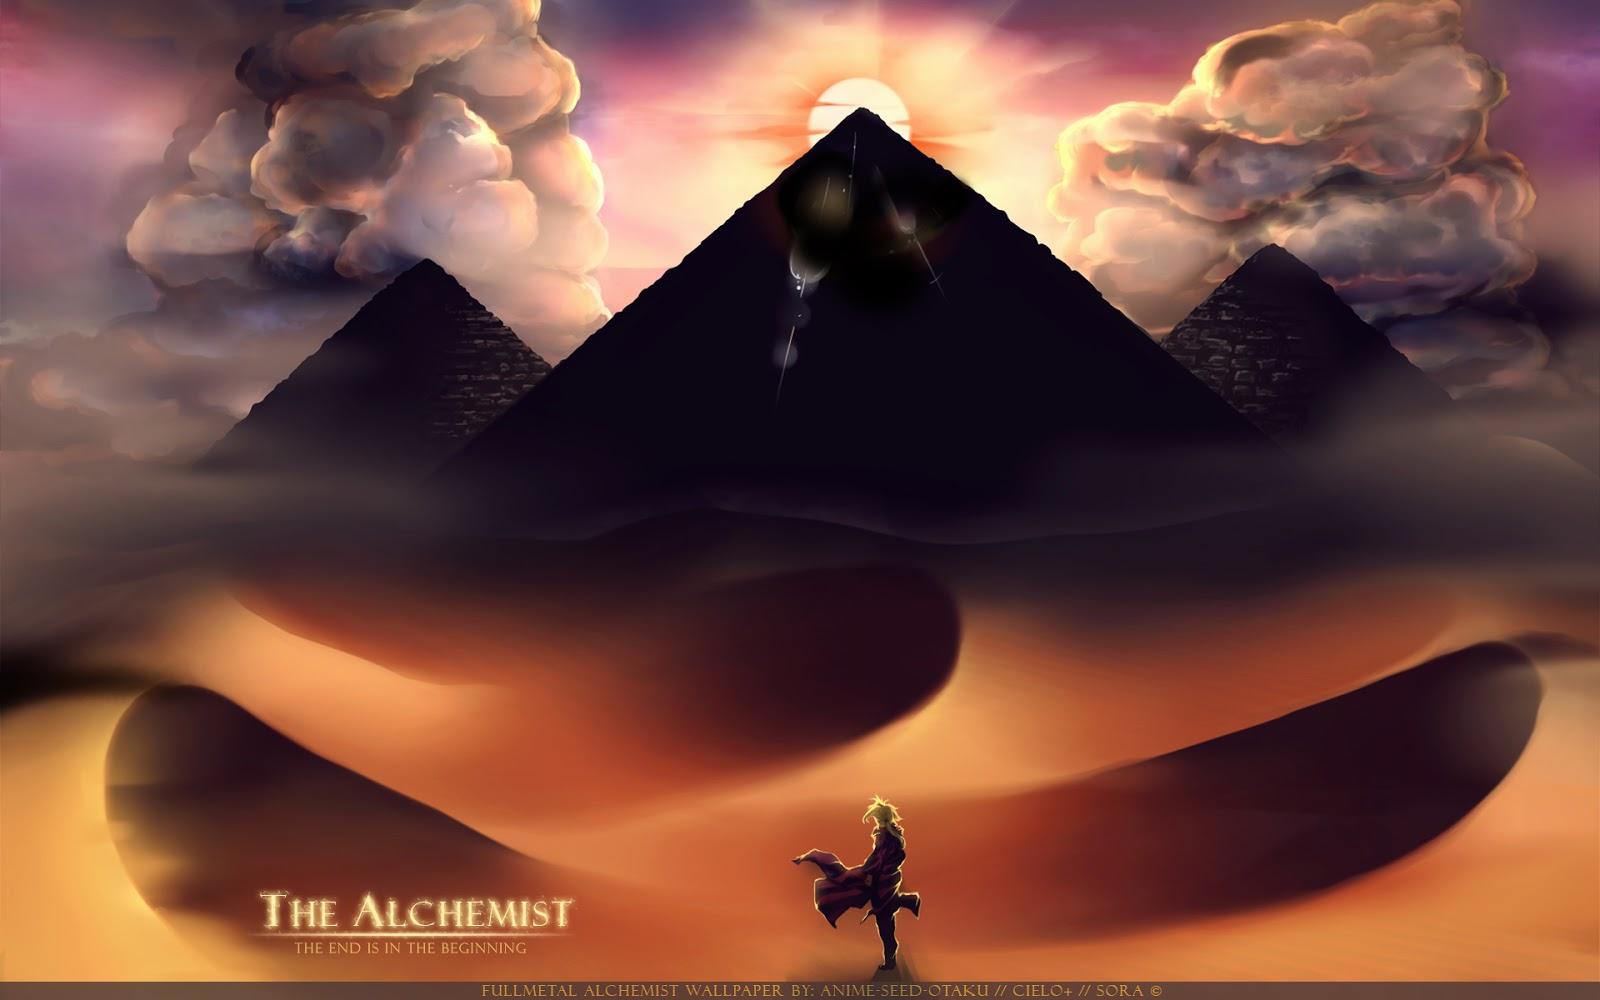 Edward Elric Fullmetal Alchemist Anime Pyramid Sand HD Wallpaper 1600x1000